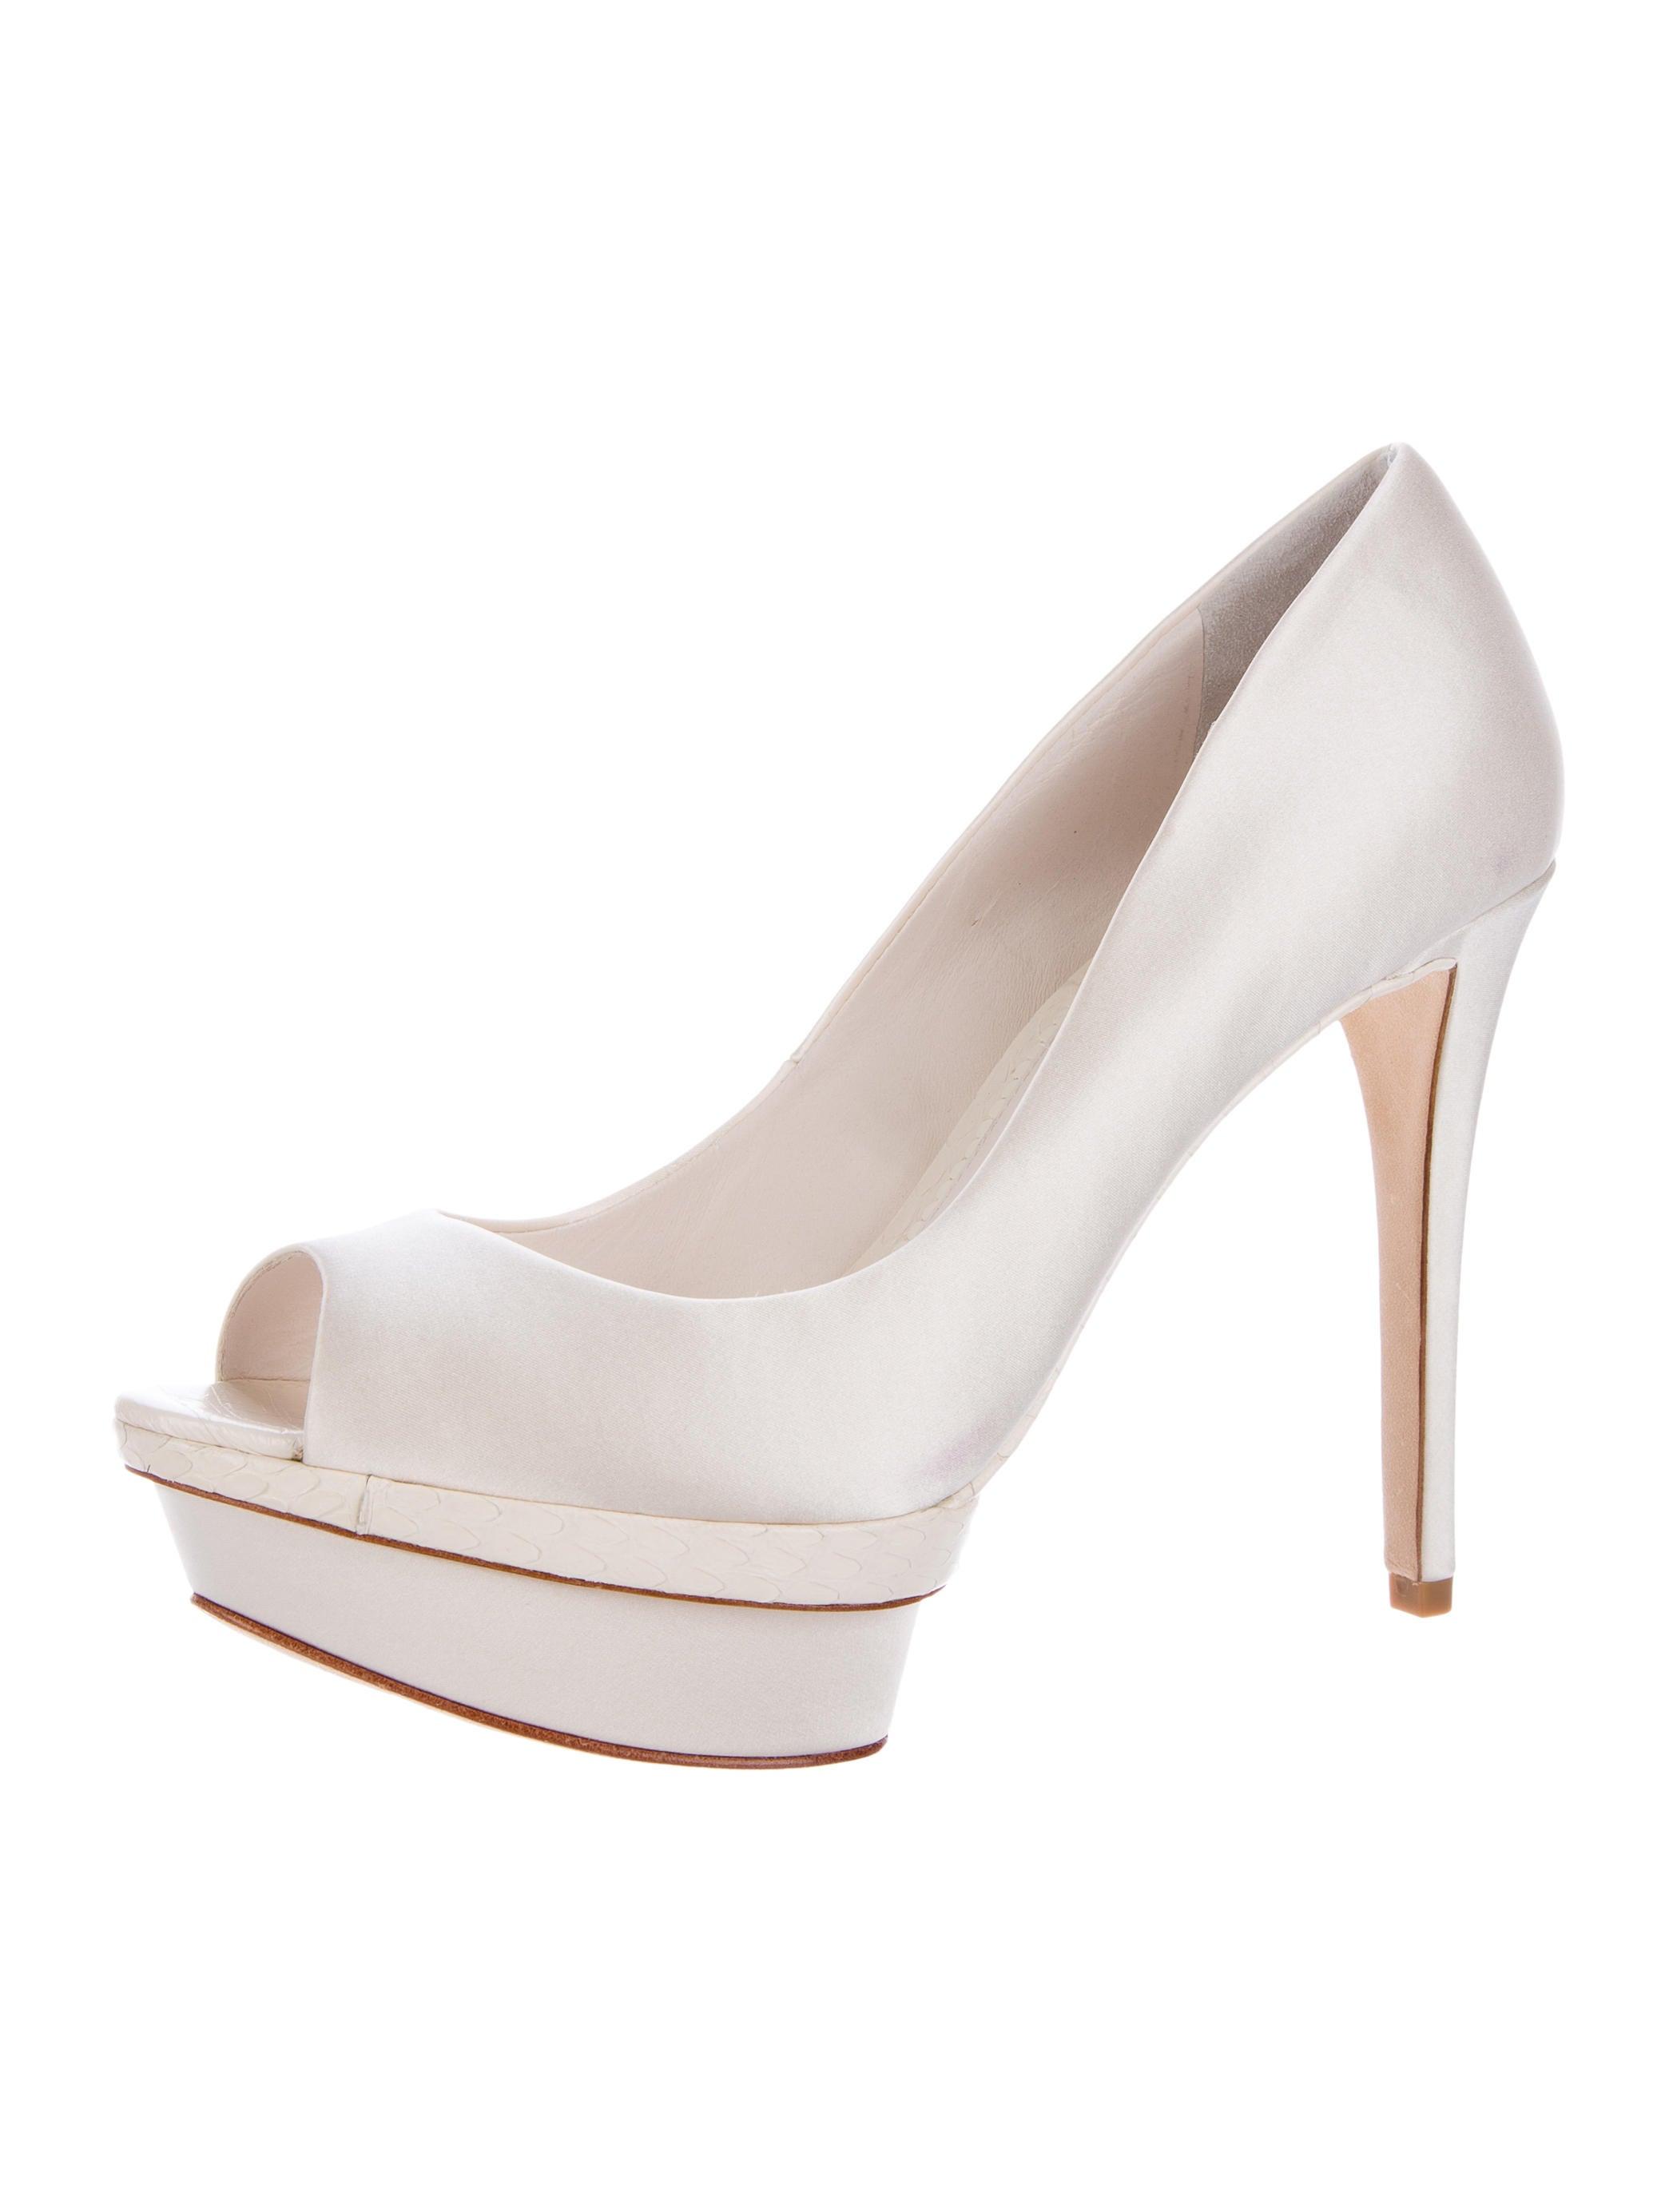 b brian atwood satin platform pumps shoes wbn22108. Black Bedroom Furniture Sets. Home Design Ideas